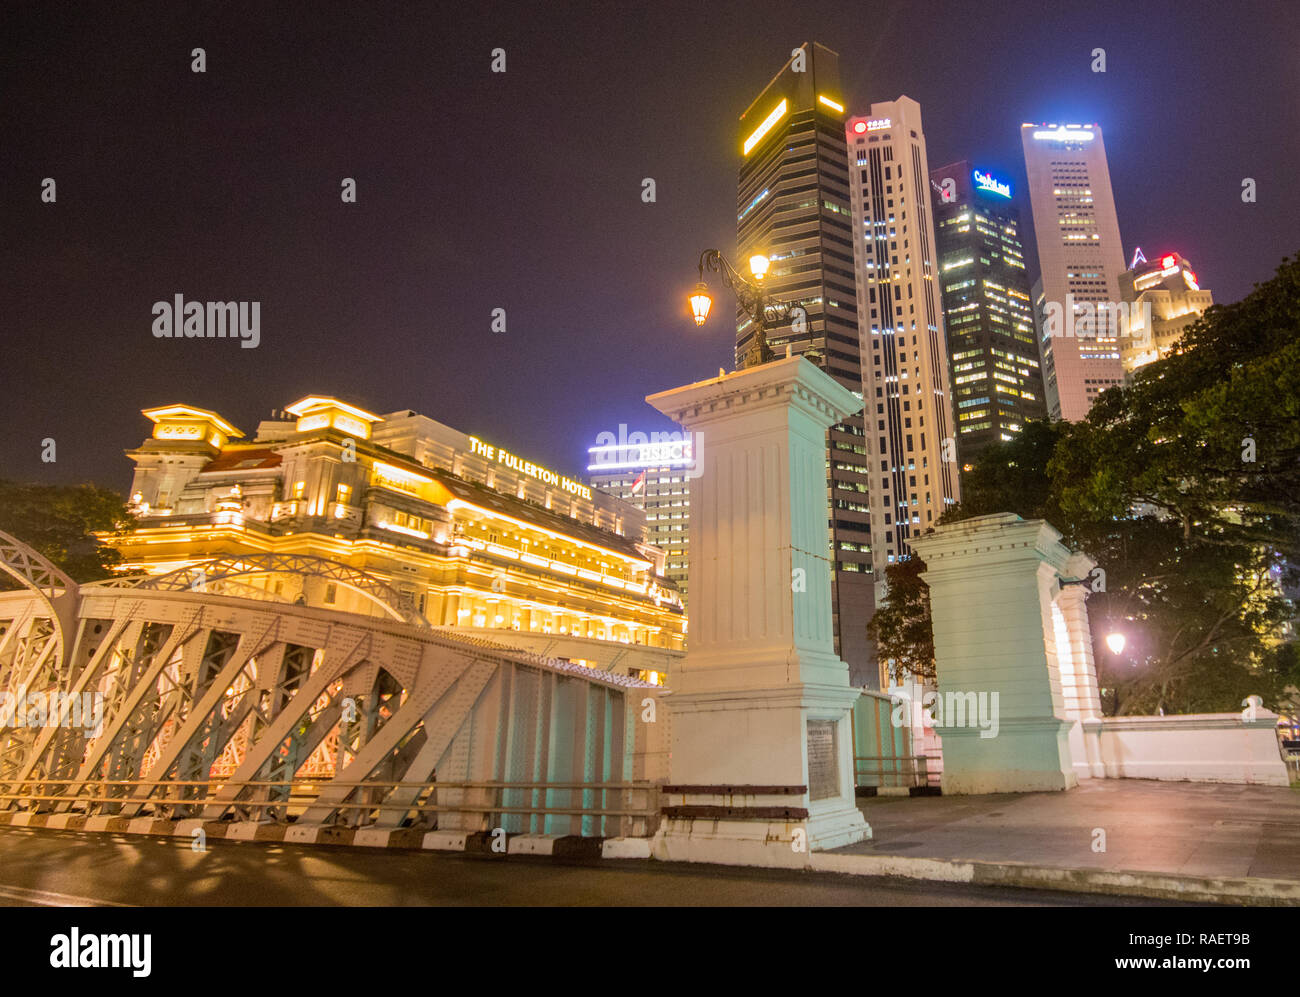 Fullerton Hotel at Anderson Bridge, Singapore Stock Photo